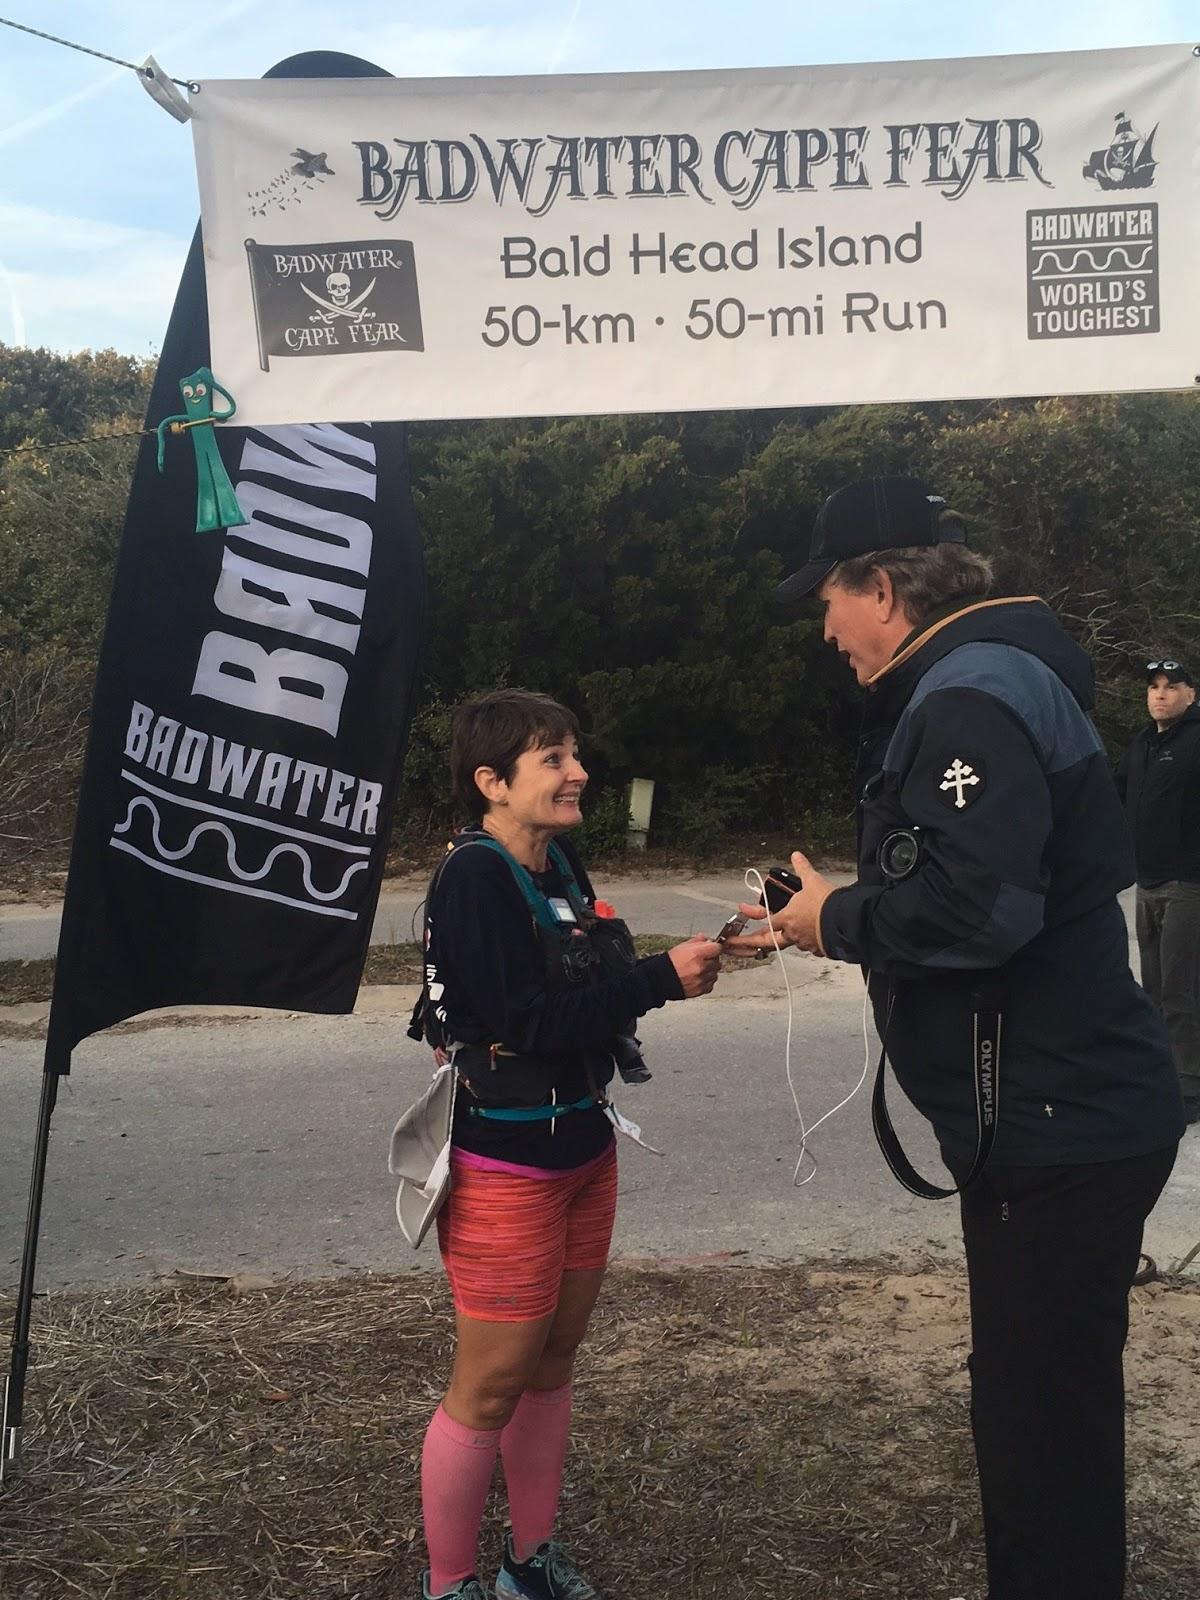 Badwater Cape Fear 51 Miles On Bald Head Island Koolaid Goes A